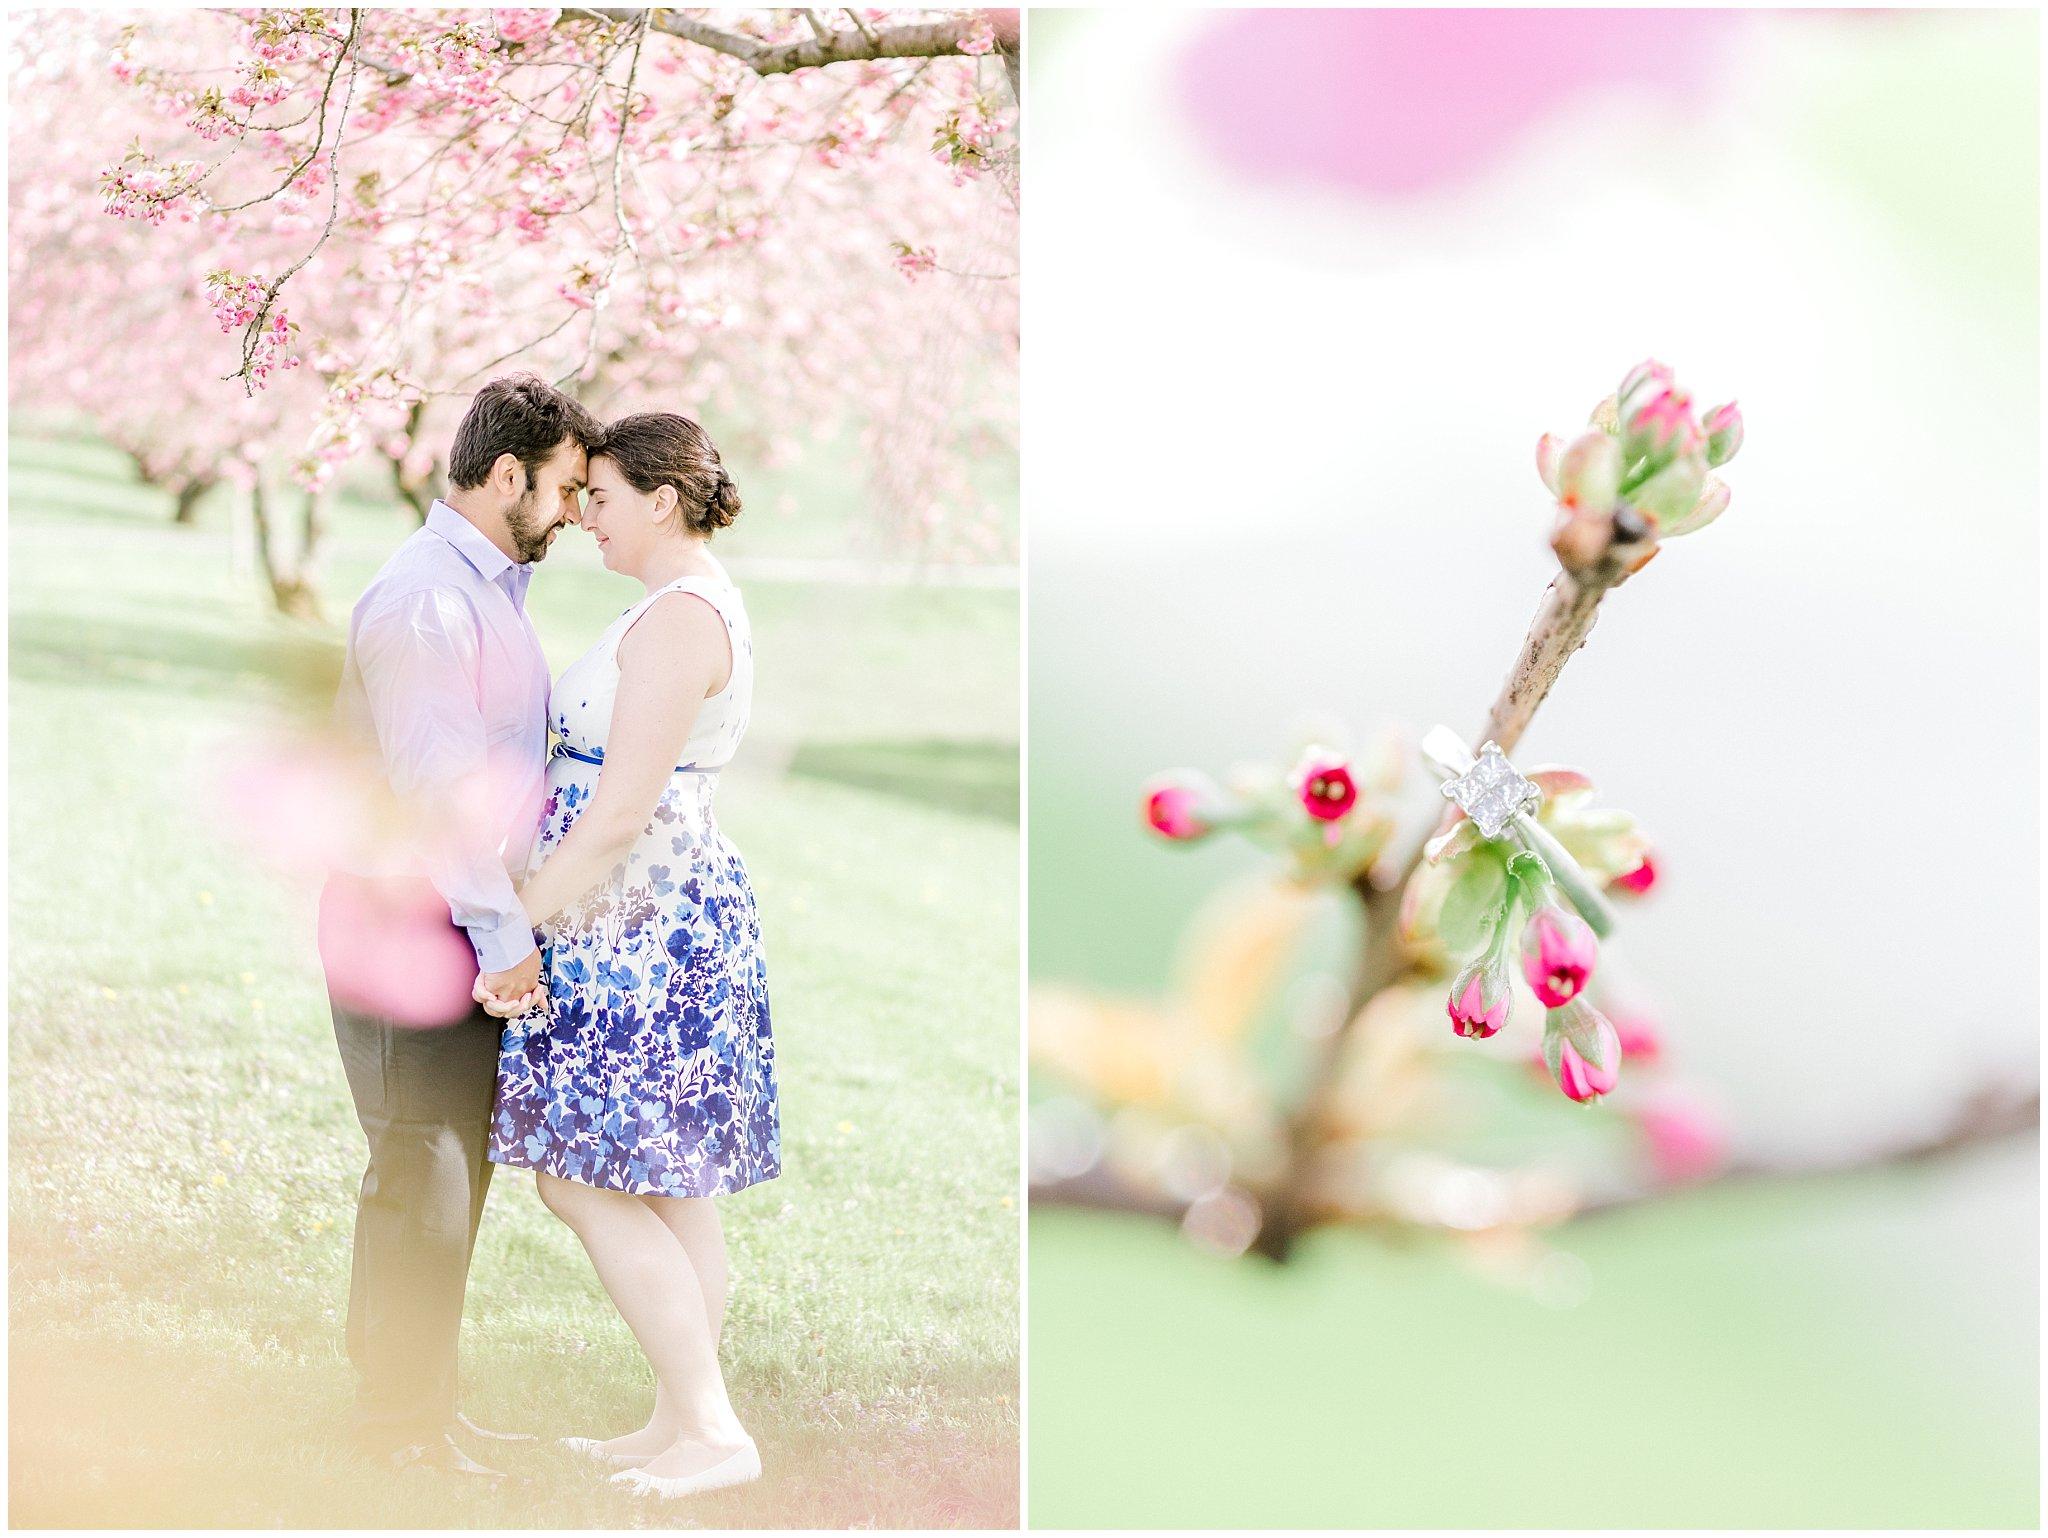 Lehigh Valley Spring Cherry Blossom Engagement Session Pennsylvania Wedding Photographer (11).jpg